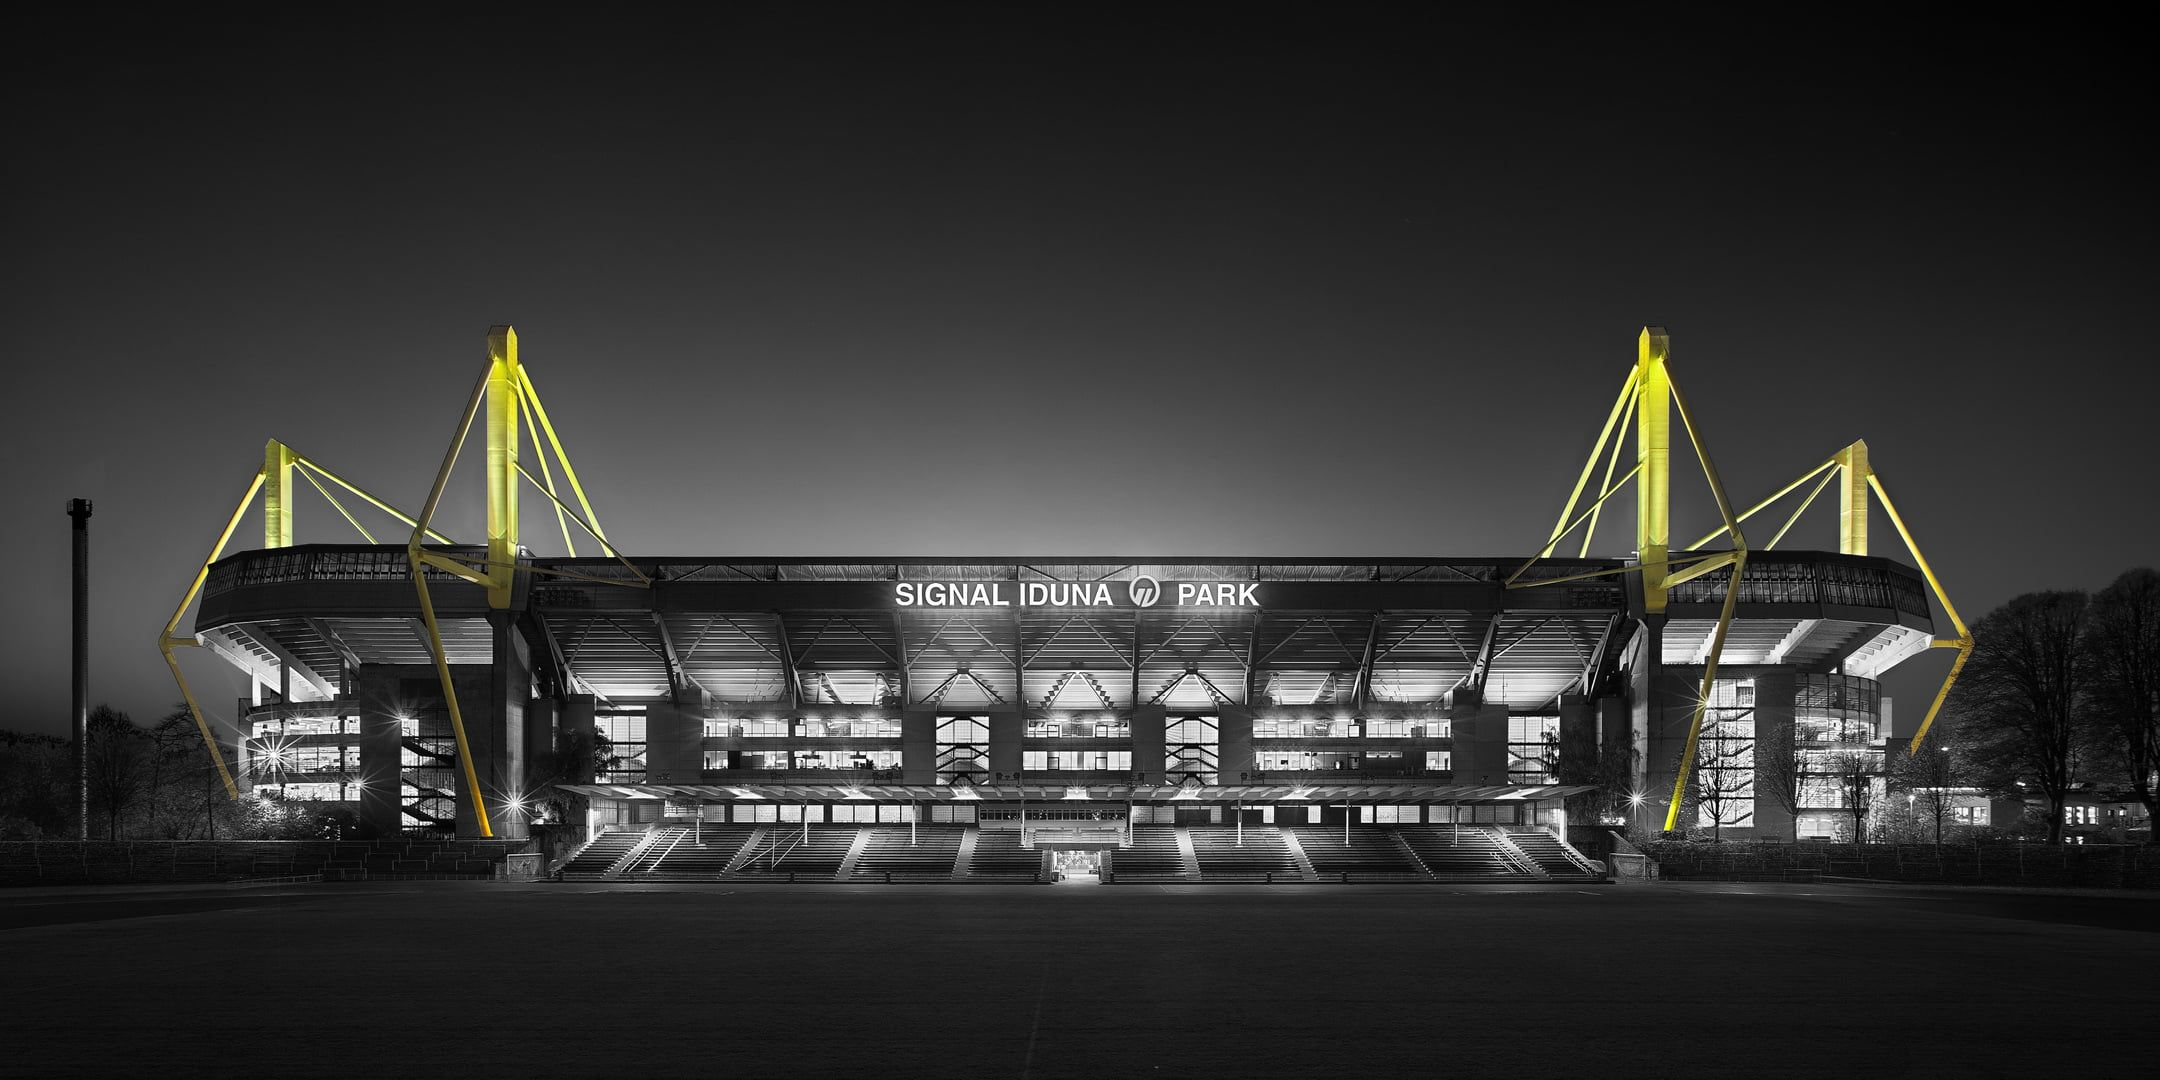 Black And Yellow Industrial Building Sport Football Dortmund Signal Iduna Park Bvb Borussia 1080p W Dortmund Borussia Dortmund Wallpaper Football Stadiums